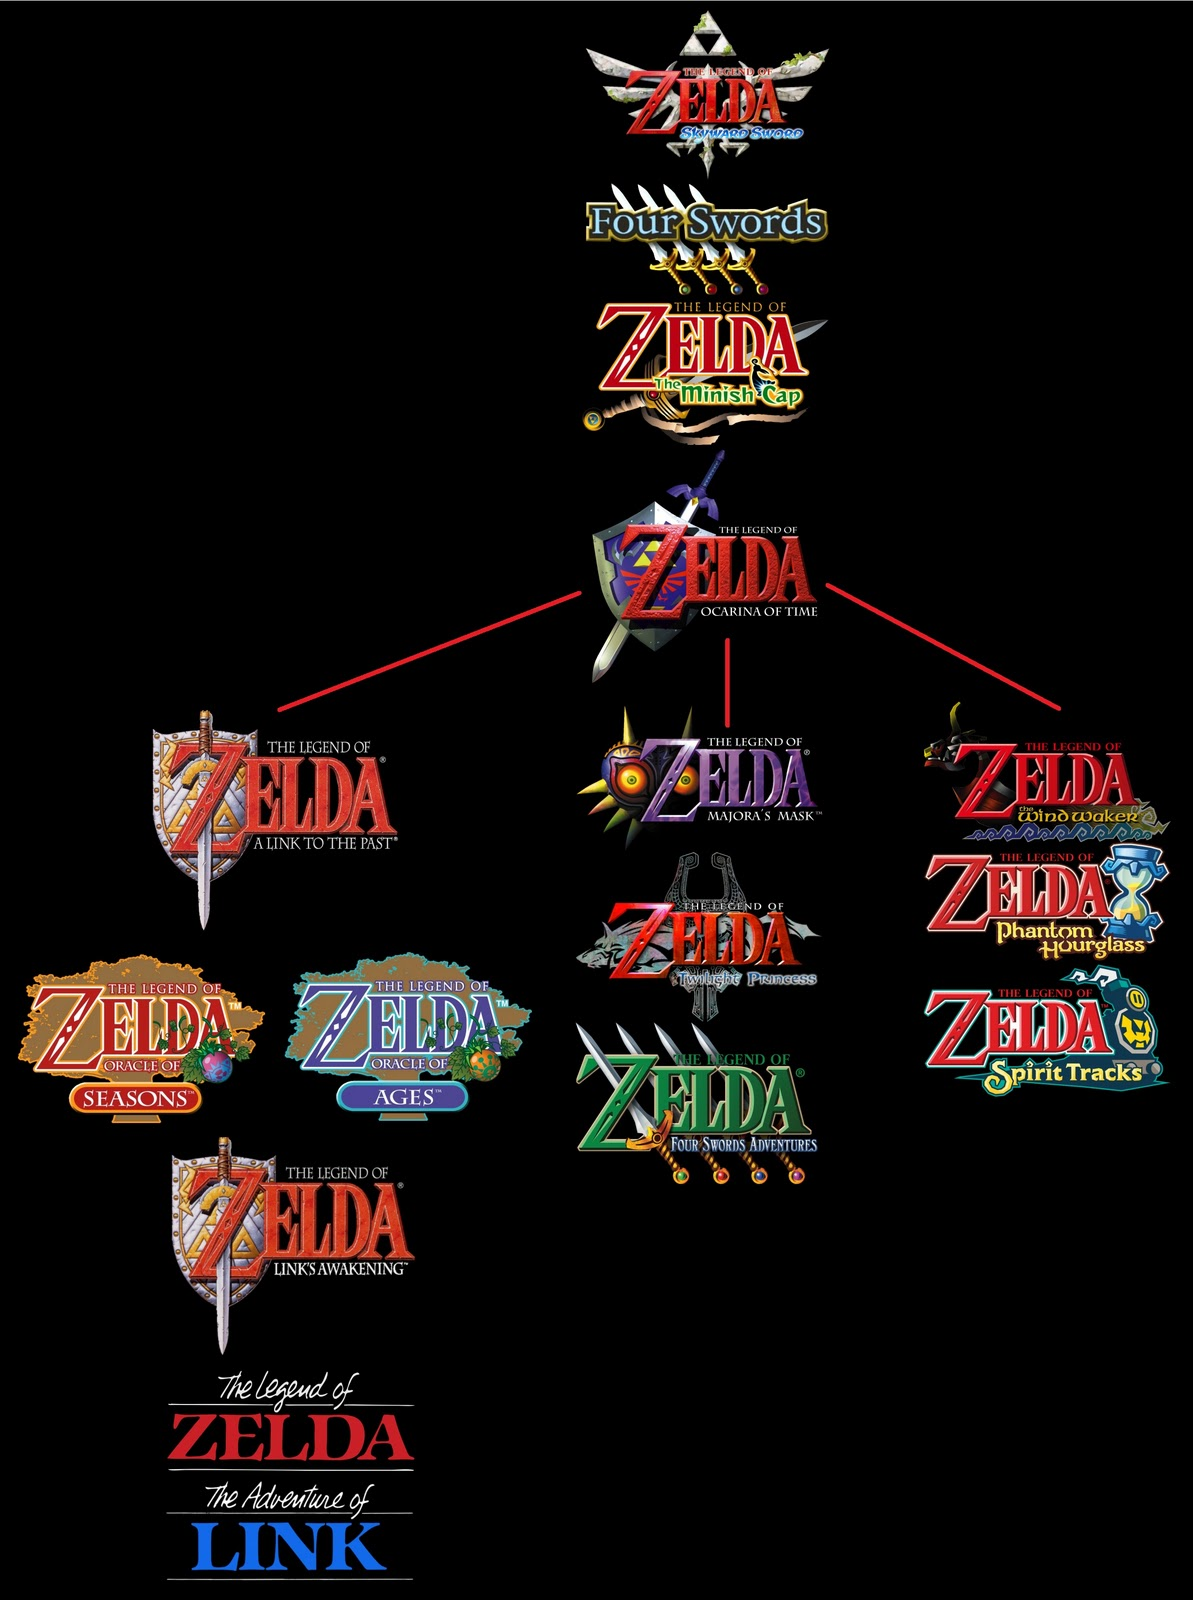 list of the legend of zelda media - wikipedia